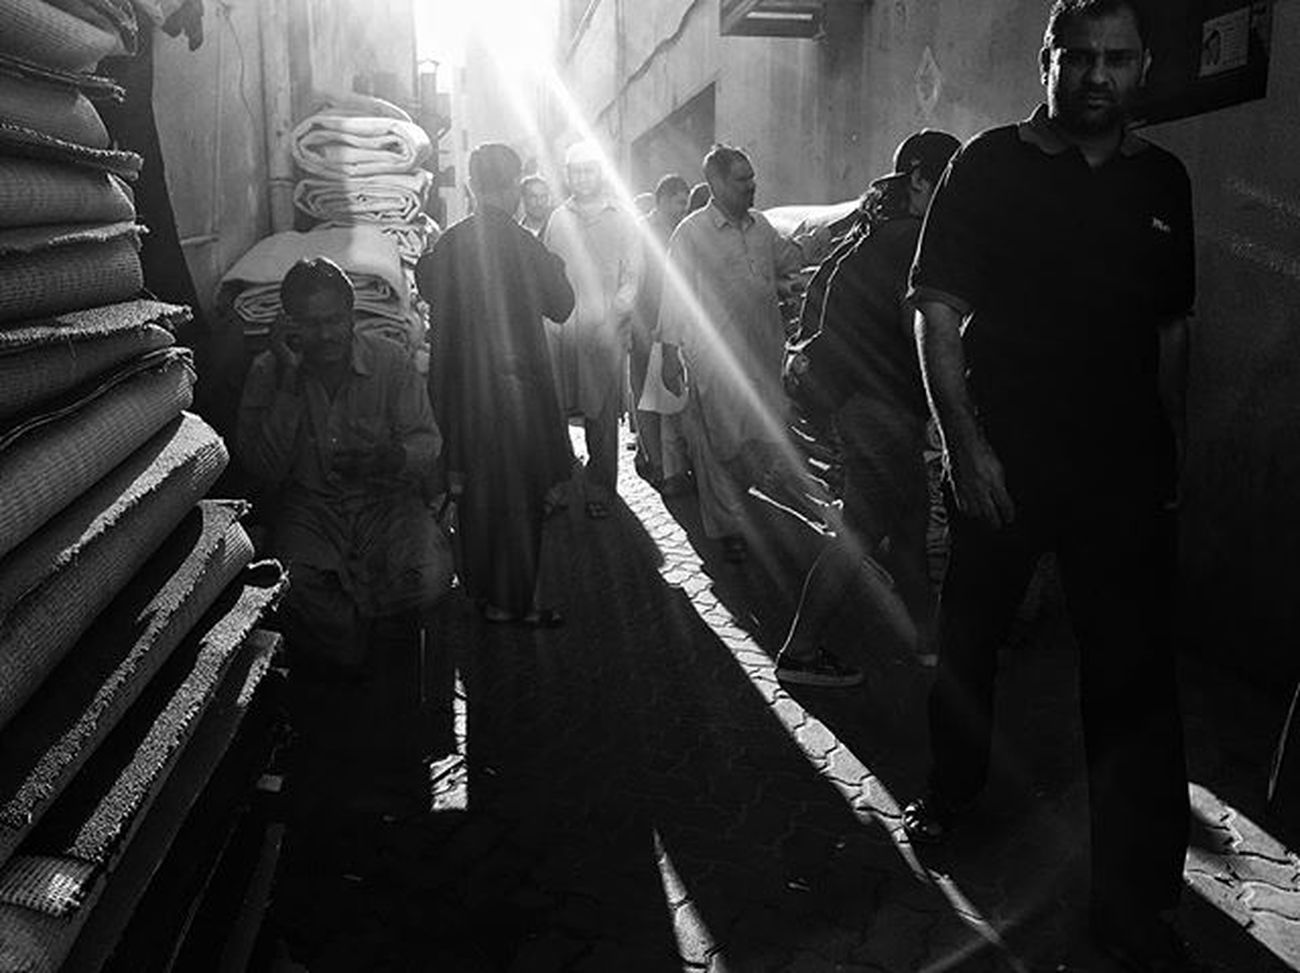 LitratistaSaDaan Daandxb NaifscenebyDay Dubaistreets Bnw_worldwide Everydaymiddleeast Bnw_universe Photooftheday Blackandwhitephotography Streettogs PW Igers Streettogs